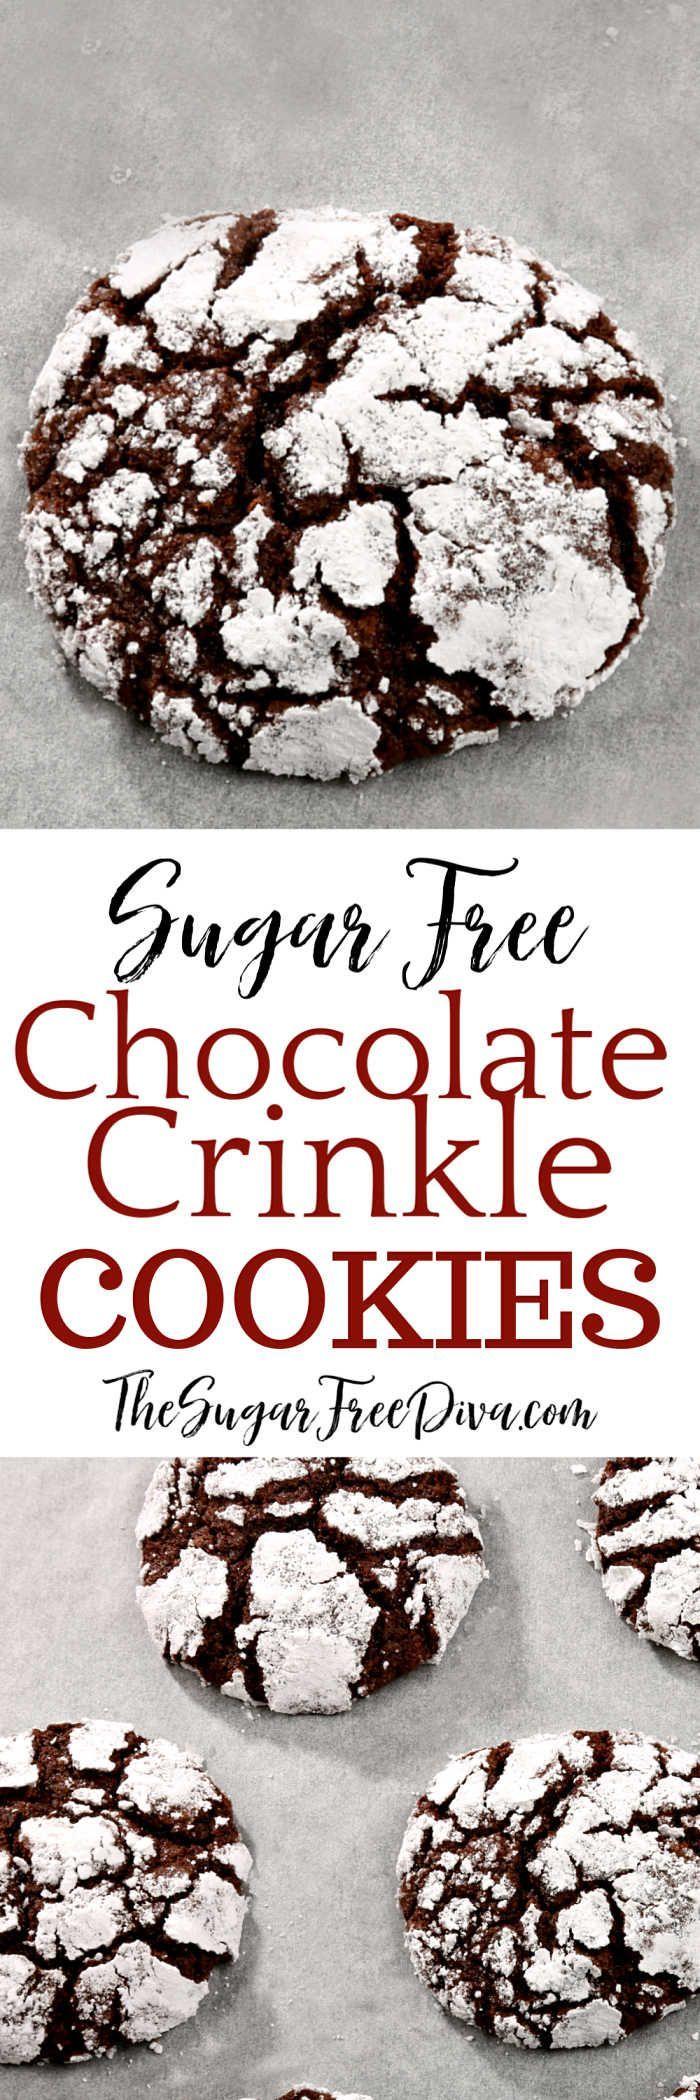 Sugar Free Chocolate Crinkle Cookies #sugarfree #chocolate #holiday #Christmas #cookies #baked # ...